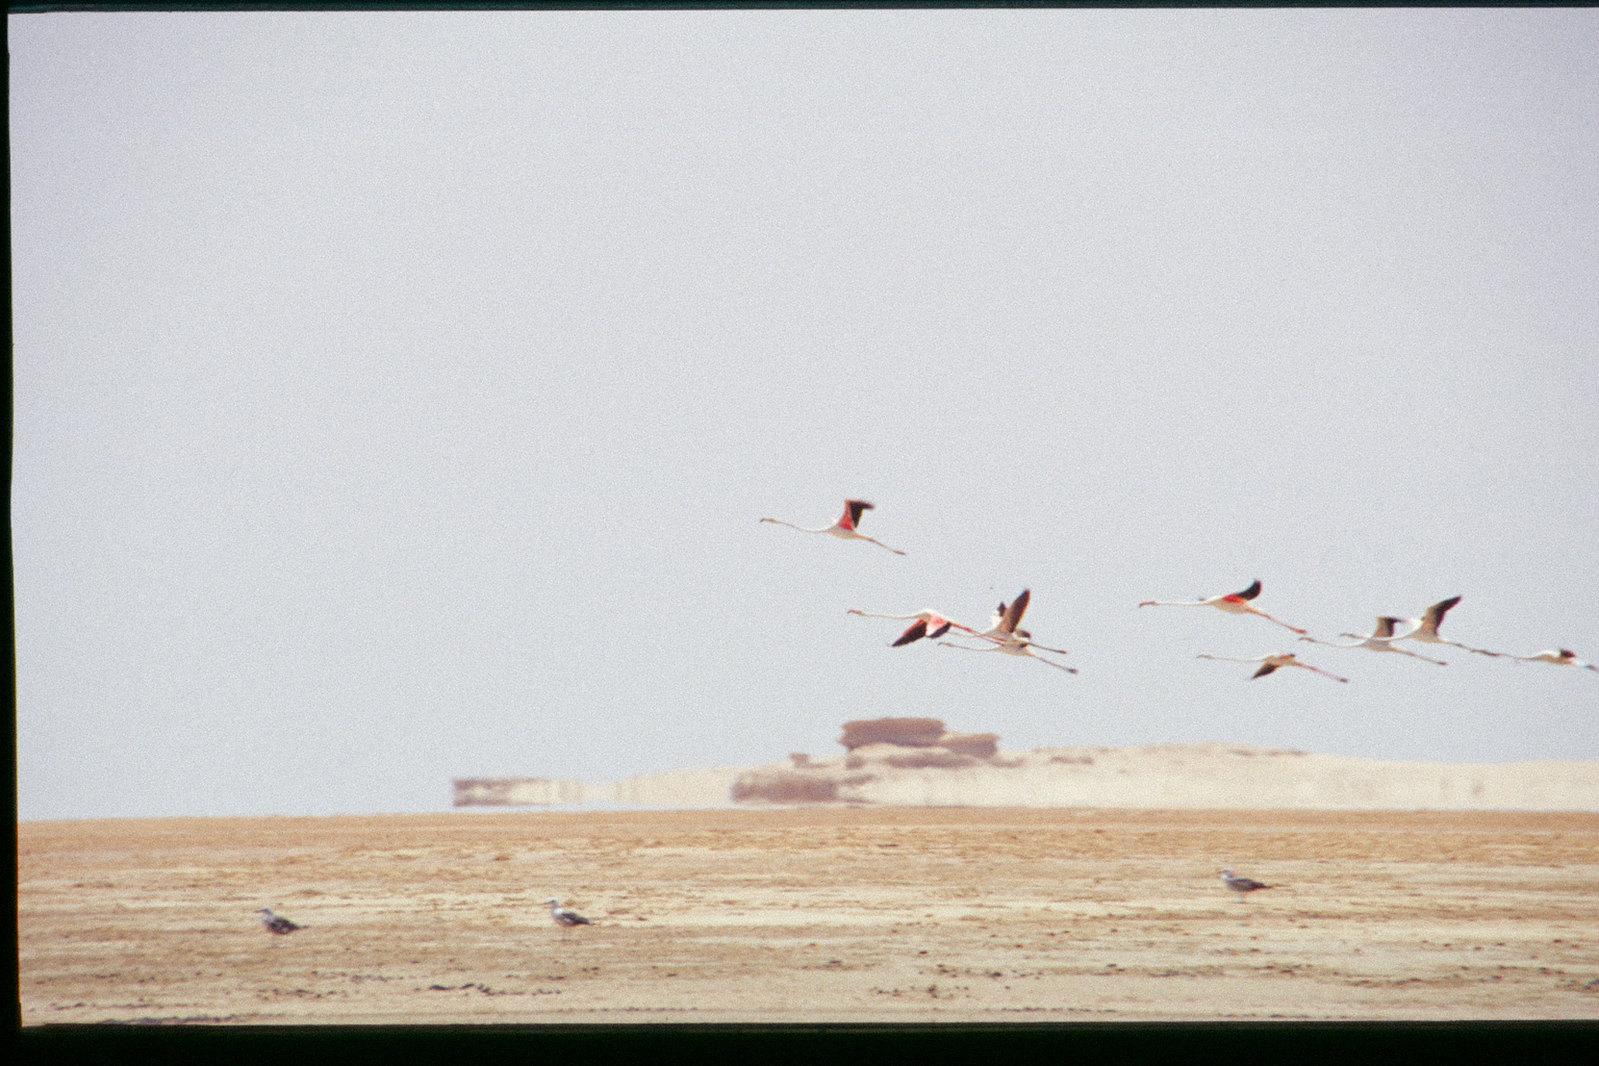 Mauritanie - Banc d'Arguin - L'envol